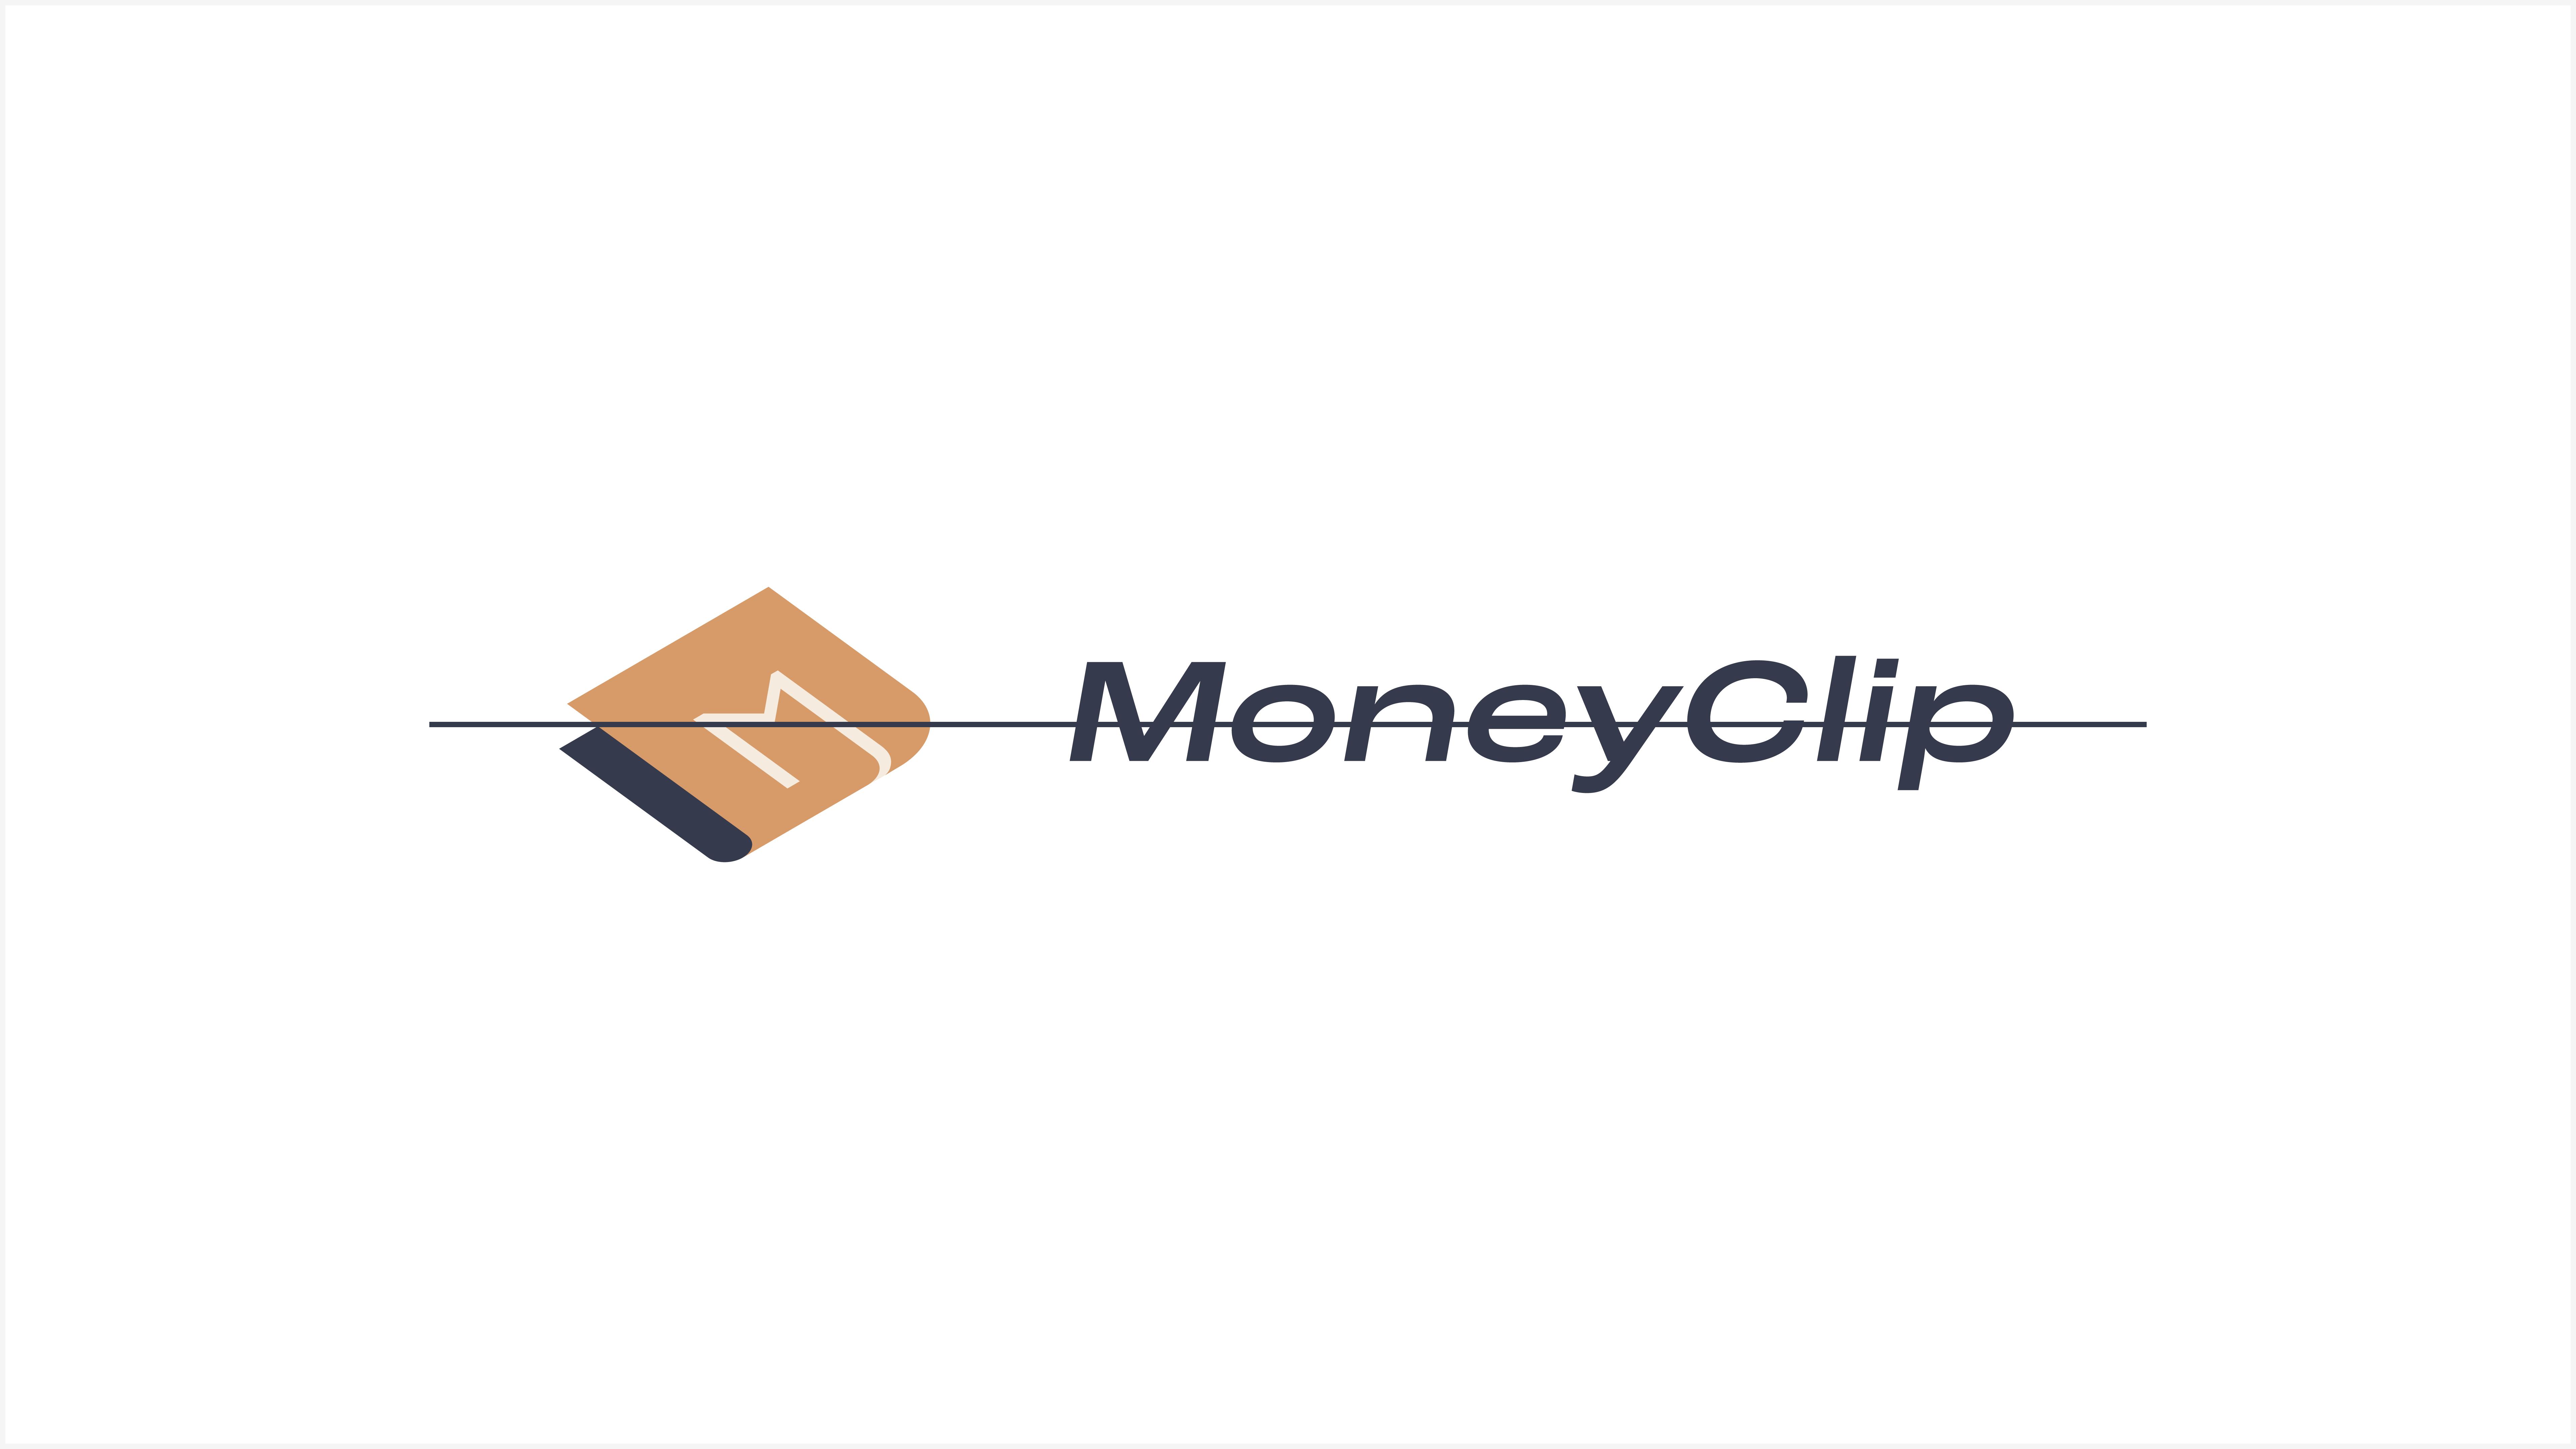 moneyclip-misuse-c